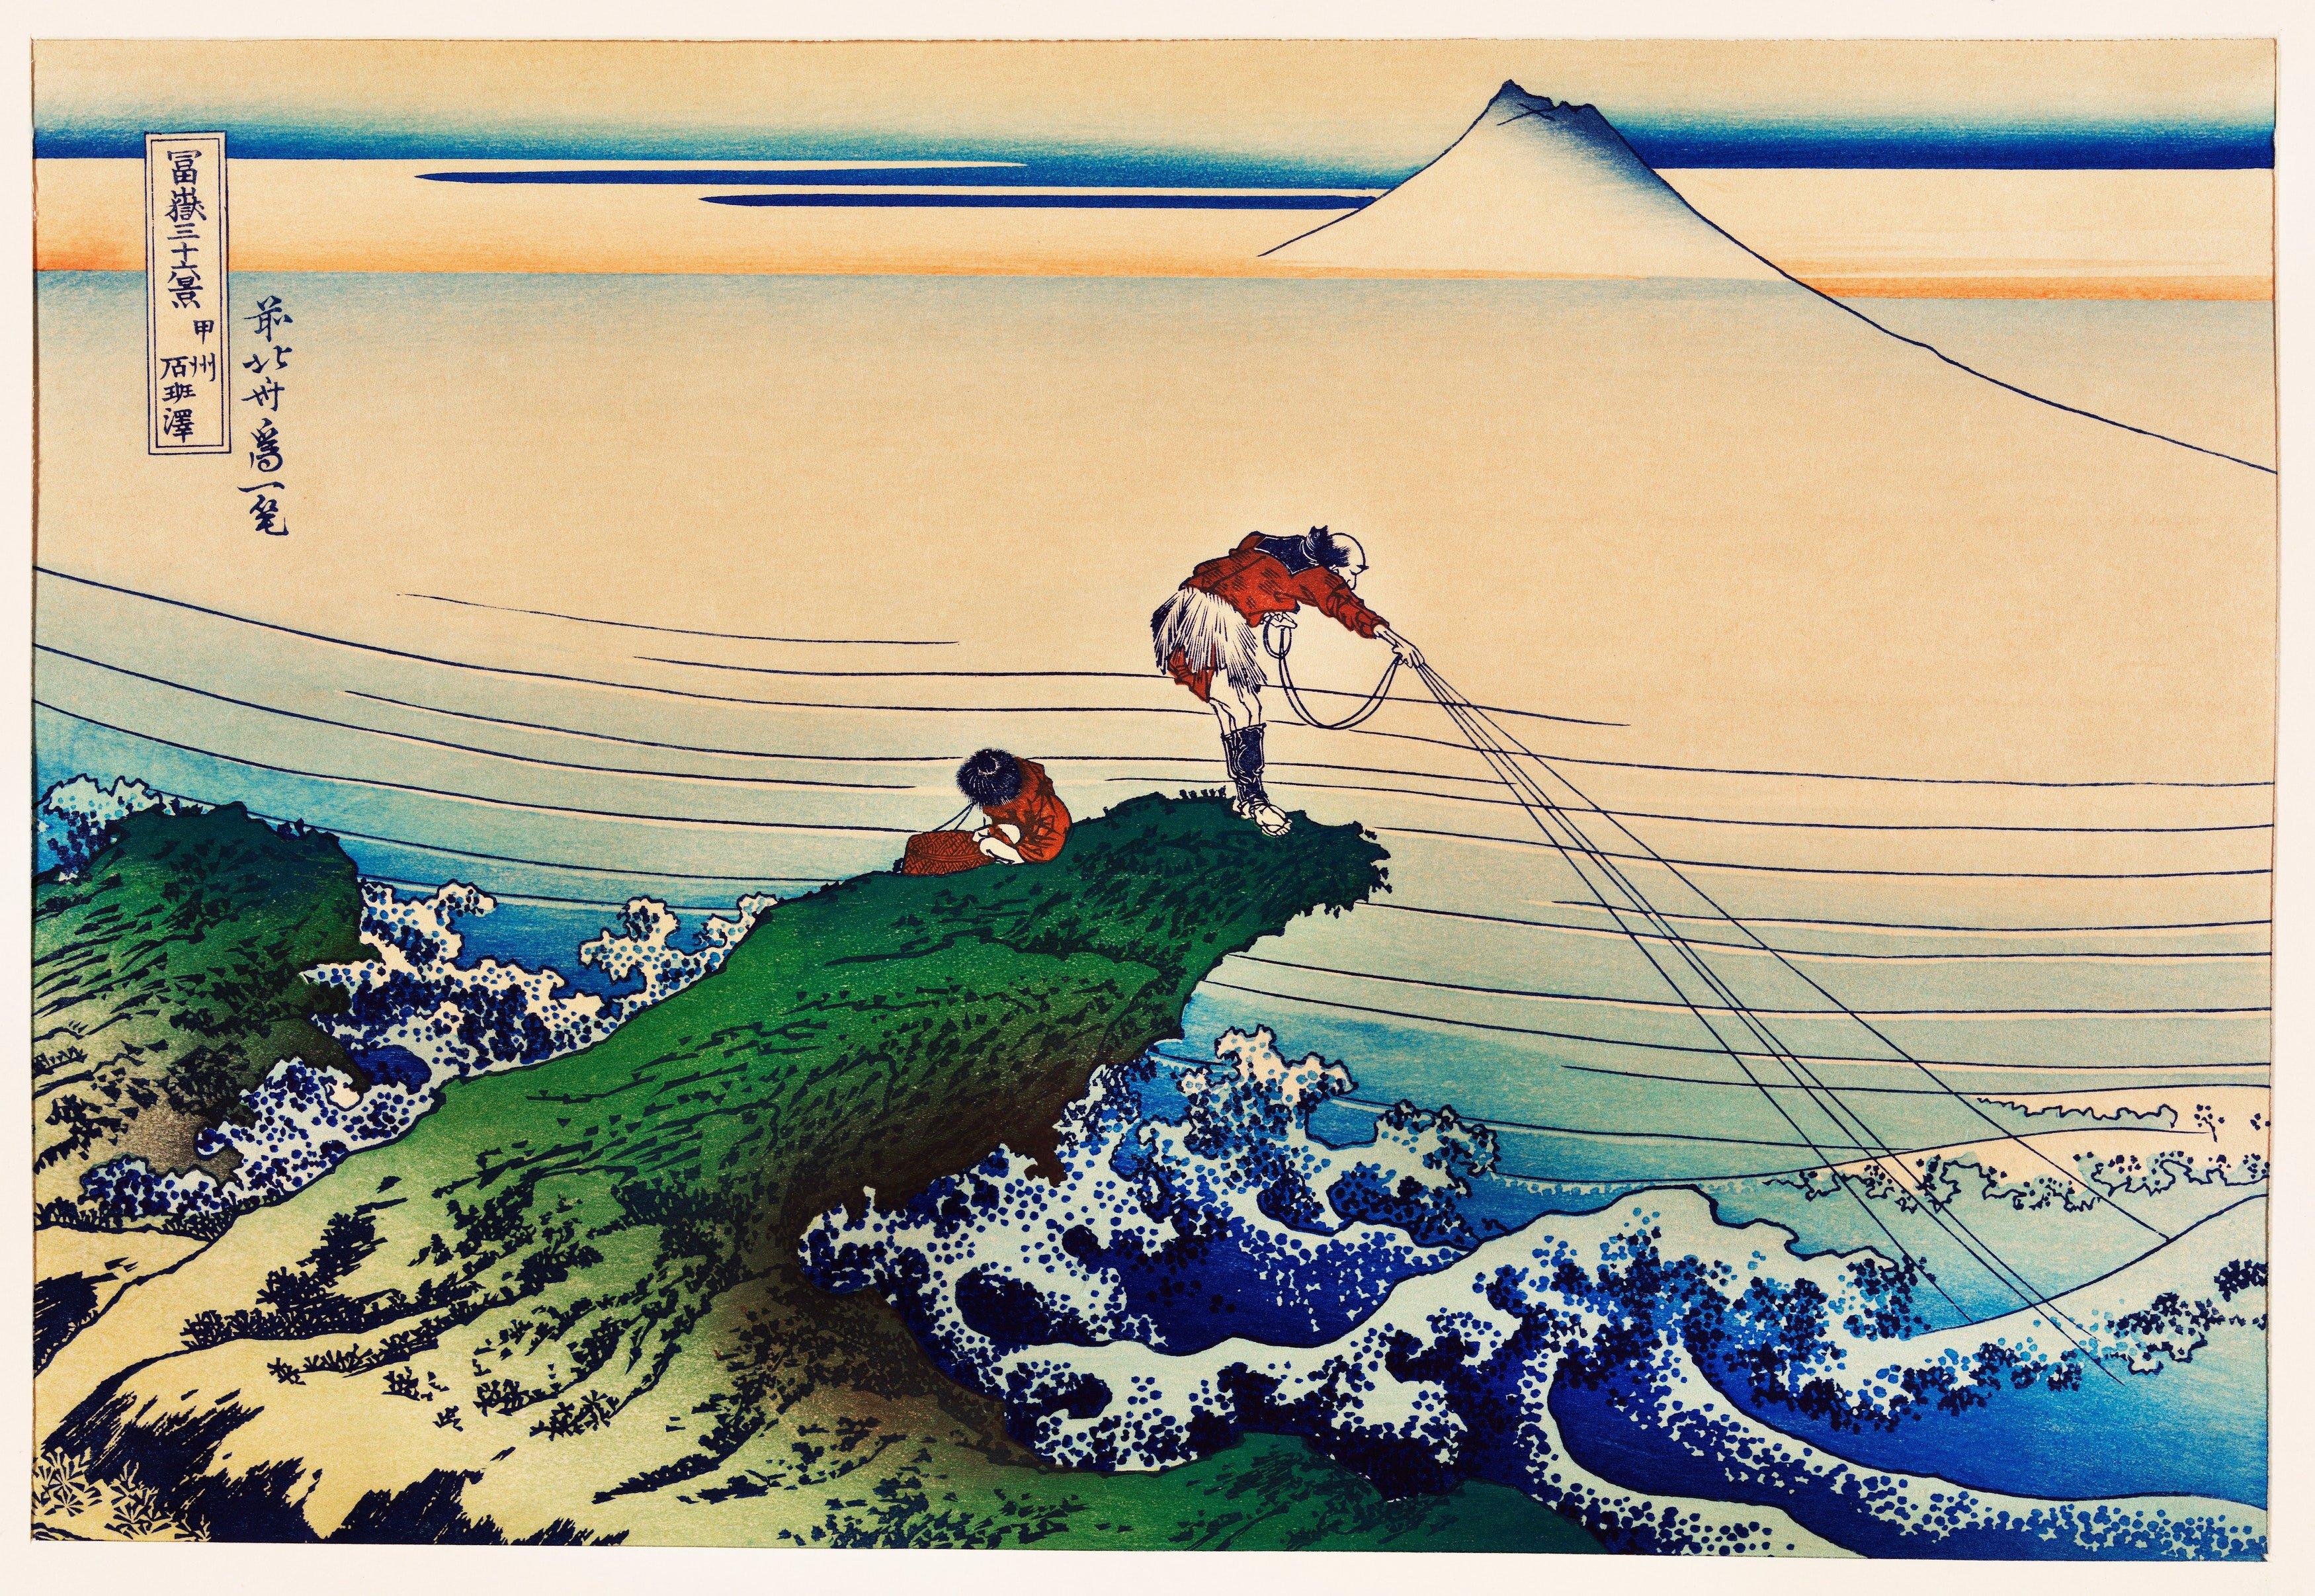 Koshu Kajikazawa by Katsushika Hokusai (1760-1849) a traditional Japanese Ukyio-e style illustration of a fisherman inland fishing with Mount Fuji in the background. Original from Library of Congress. Digitally enhanced by rawpixel